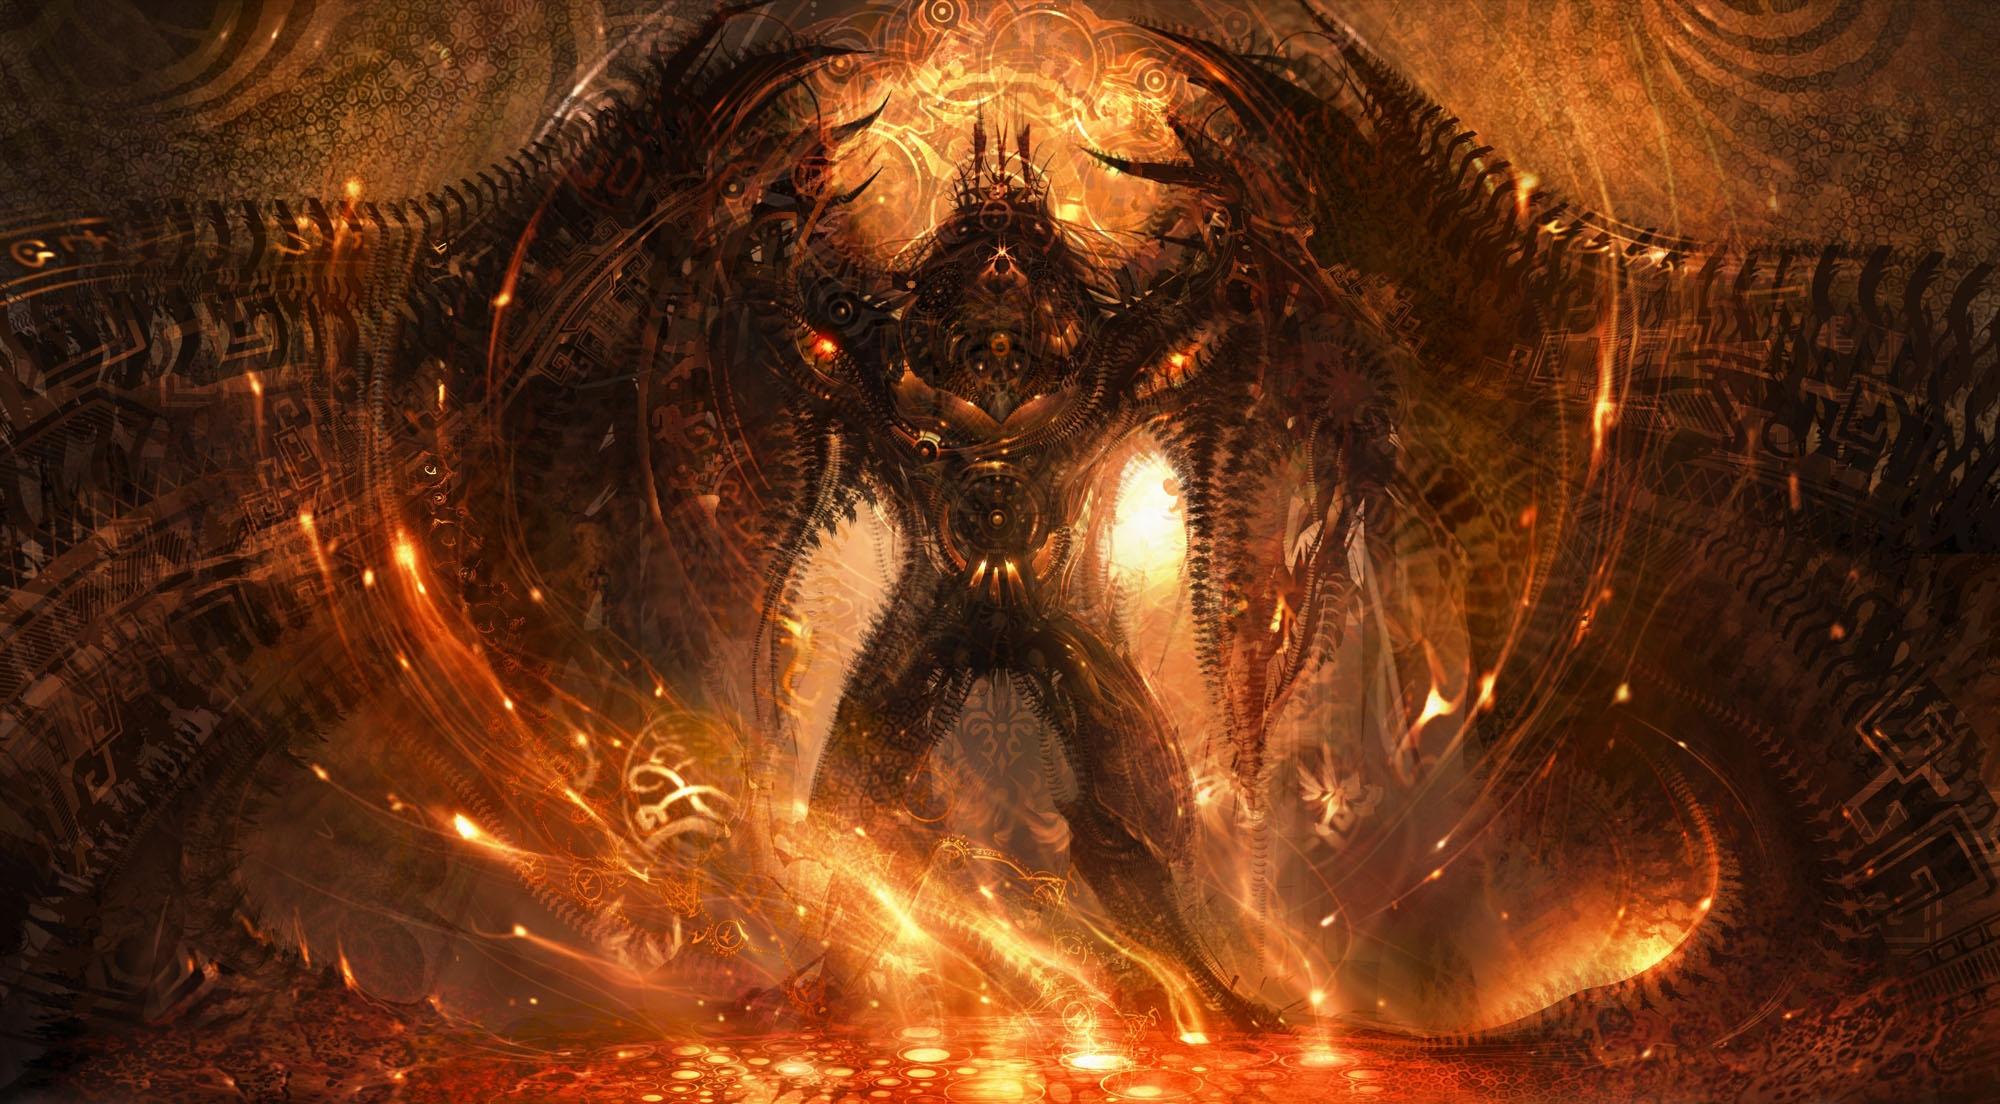 Download Dark Demon Wallpaper 2000x1104 Wallpoper 222934 2000x1104